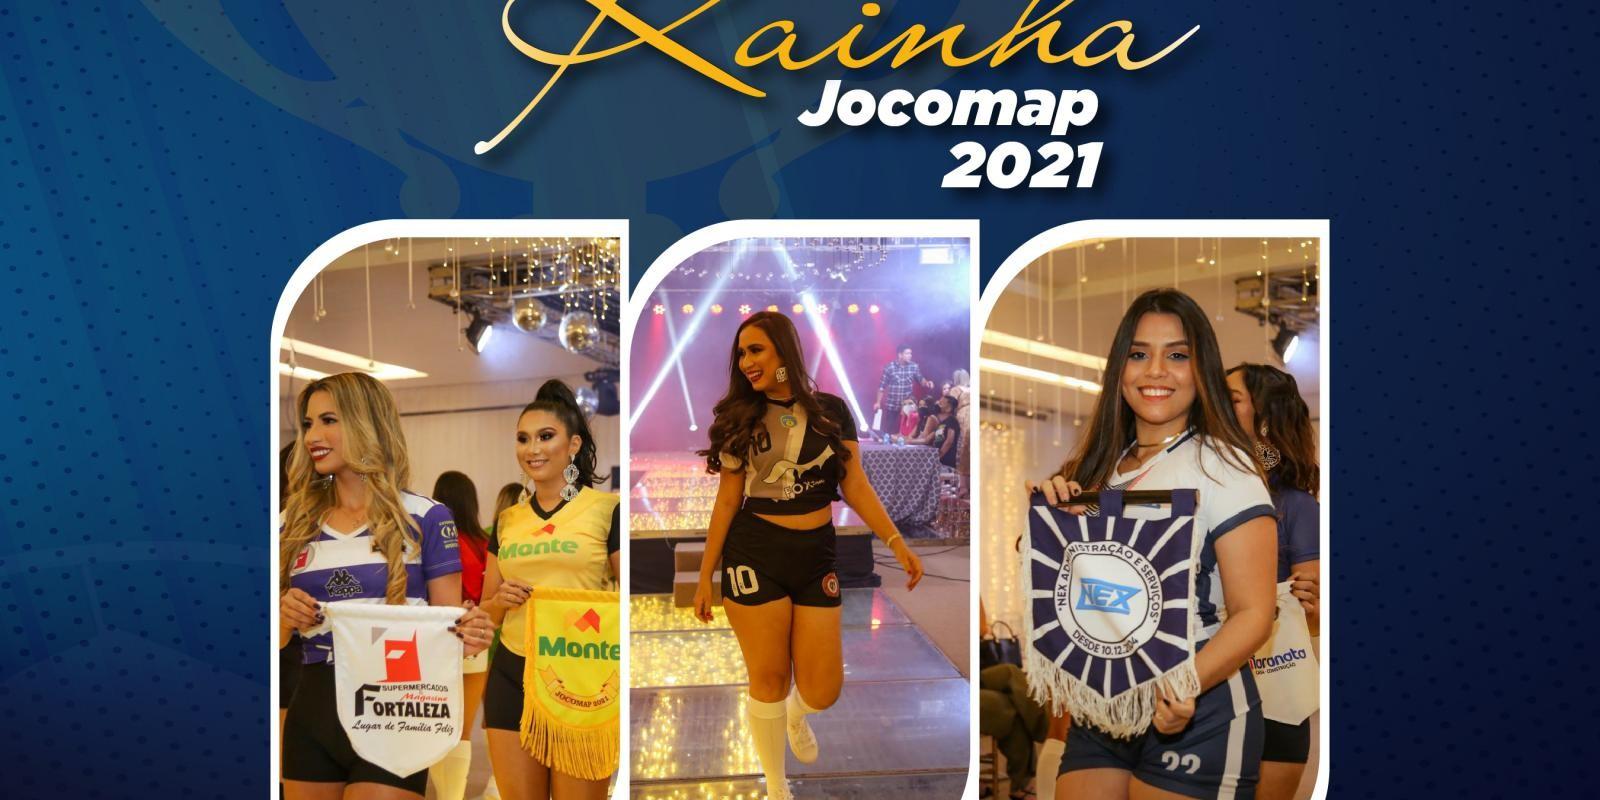 Resultado #3 Terceira Etapa - Concurso Rainha Jocomap 2021